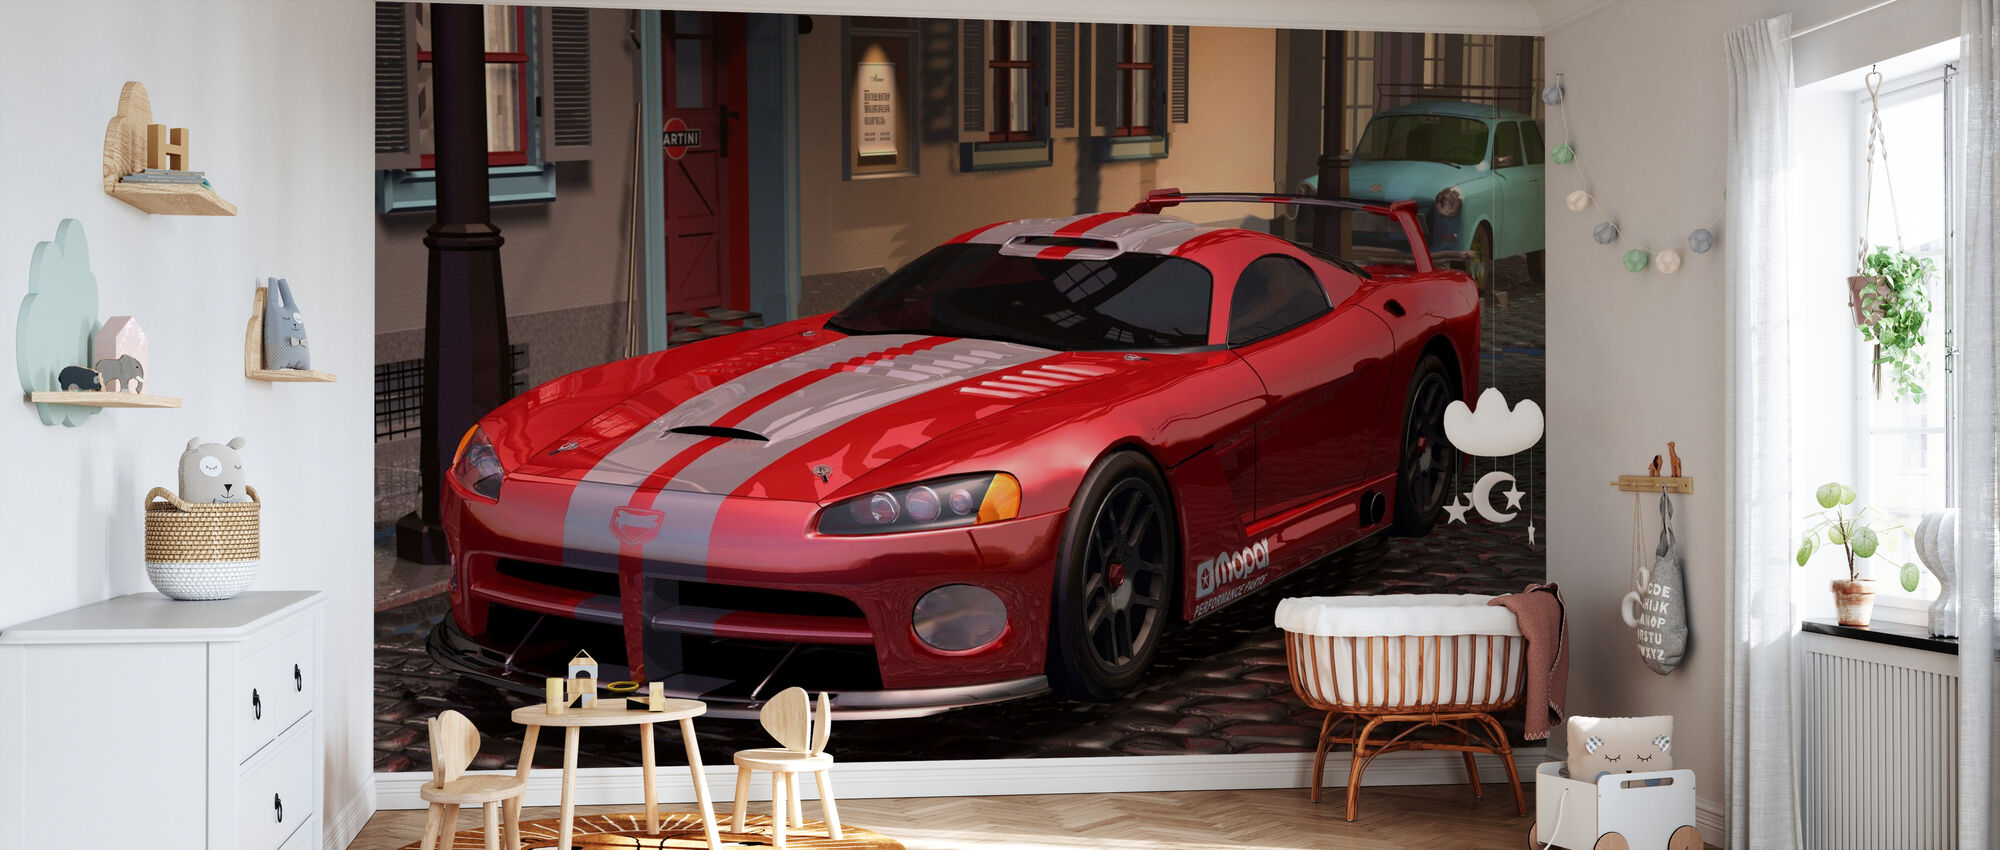 Red Fast Car - Wallpaper - Nursery